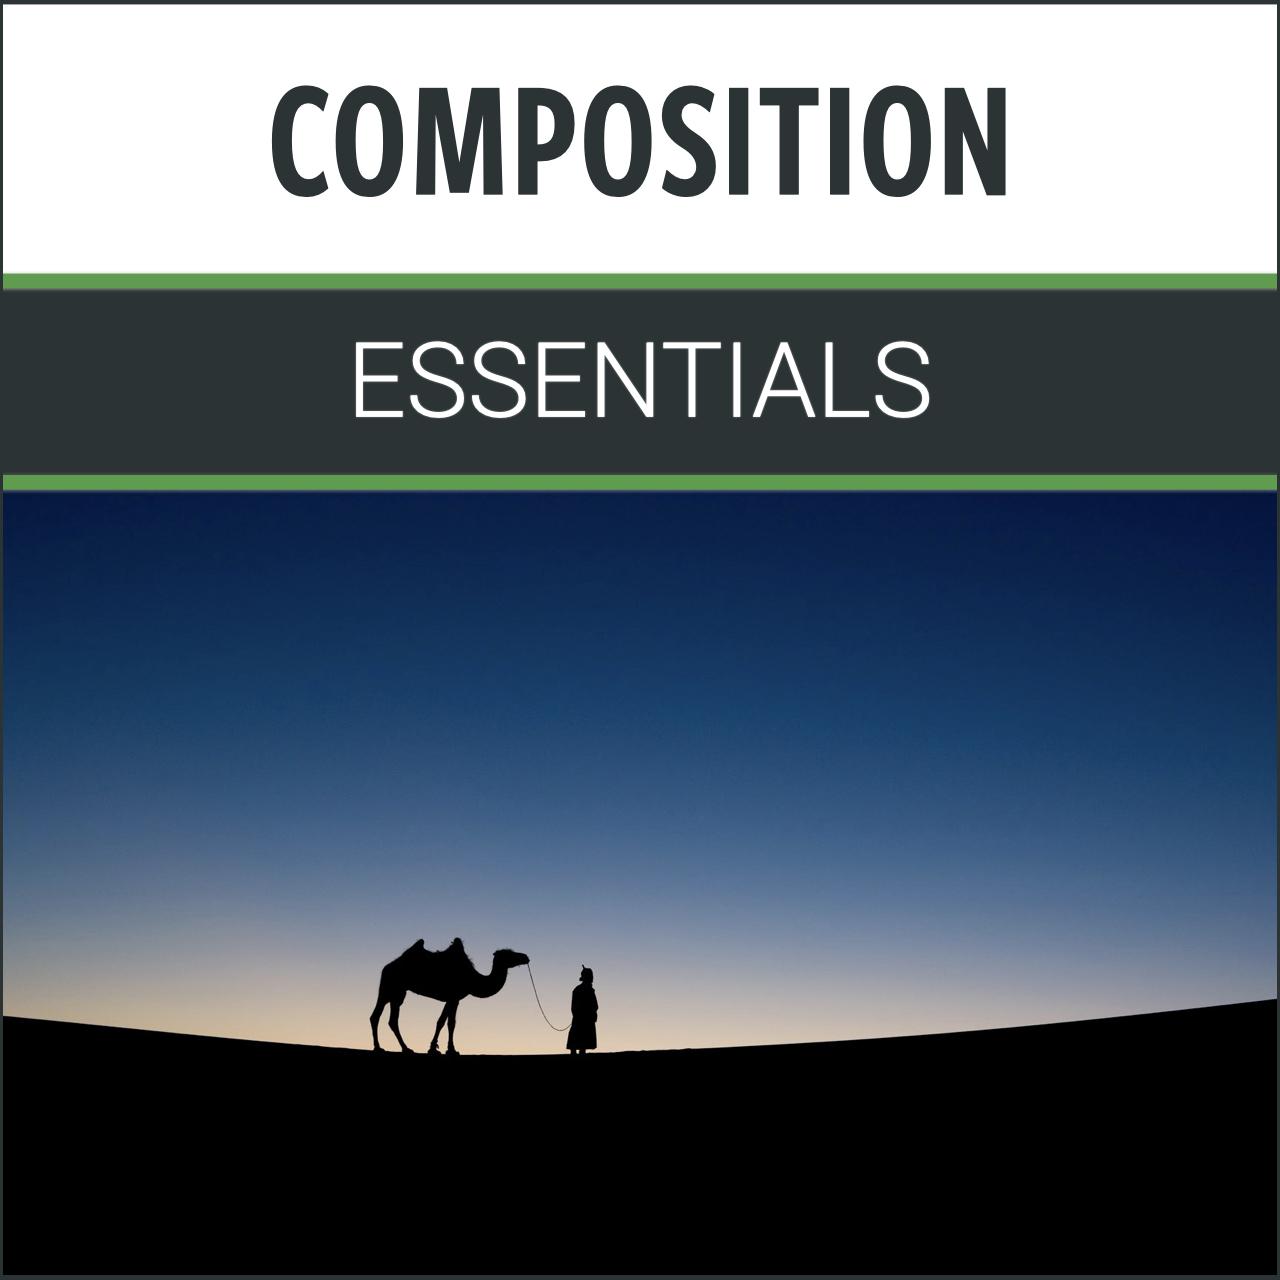 Composition Essentials